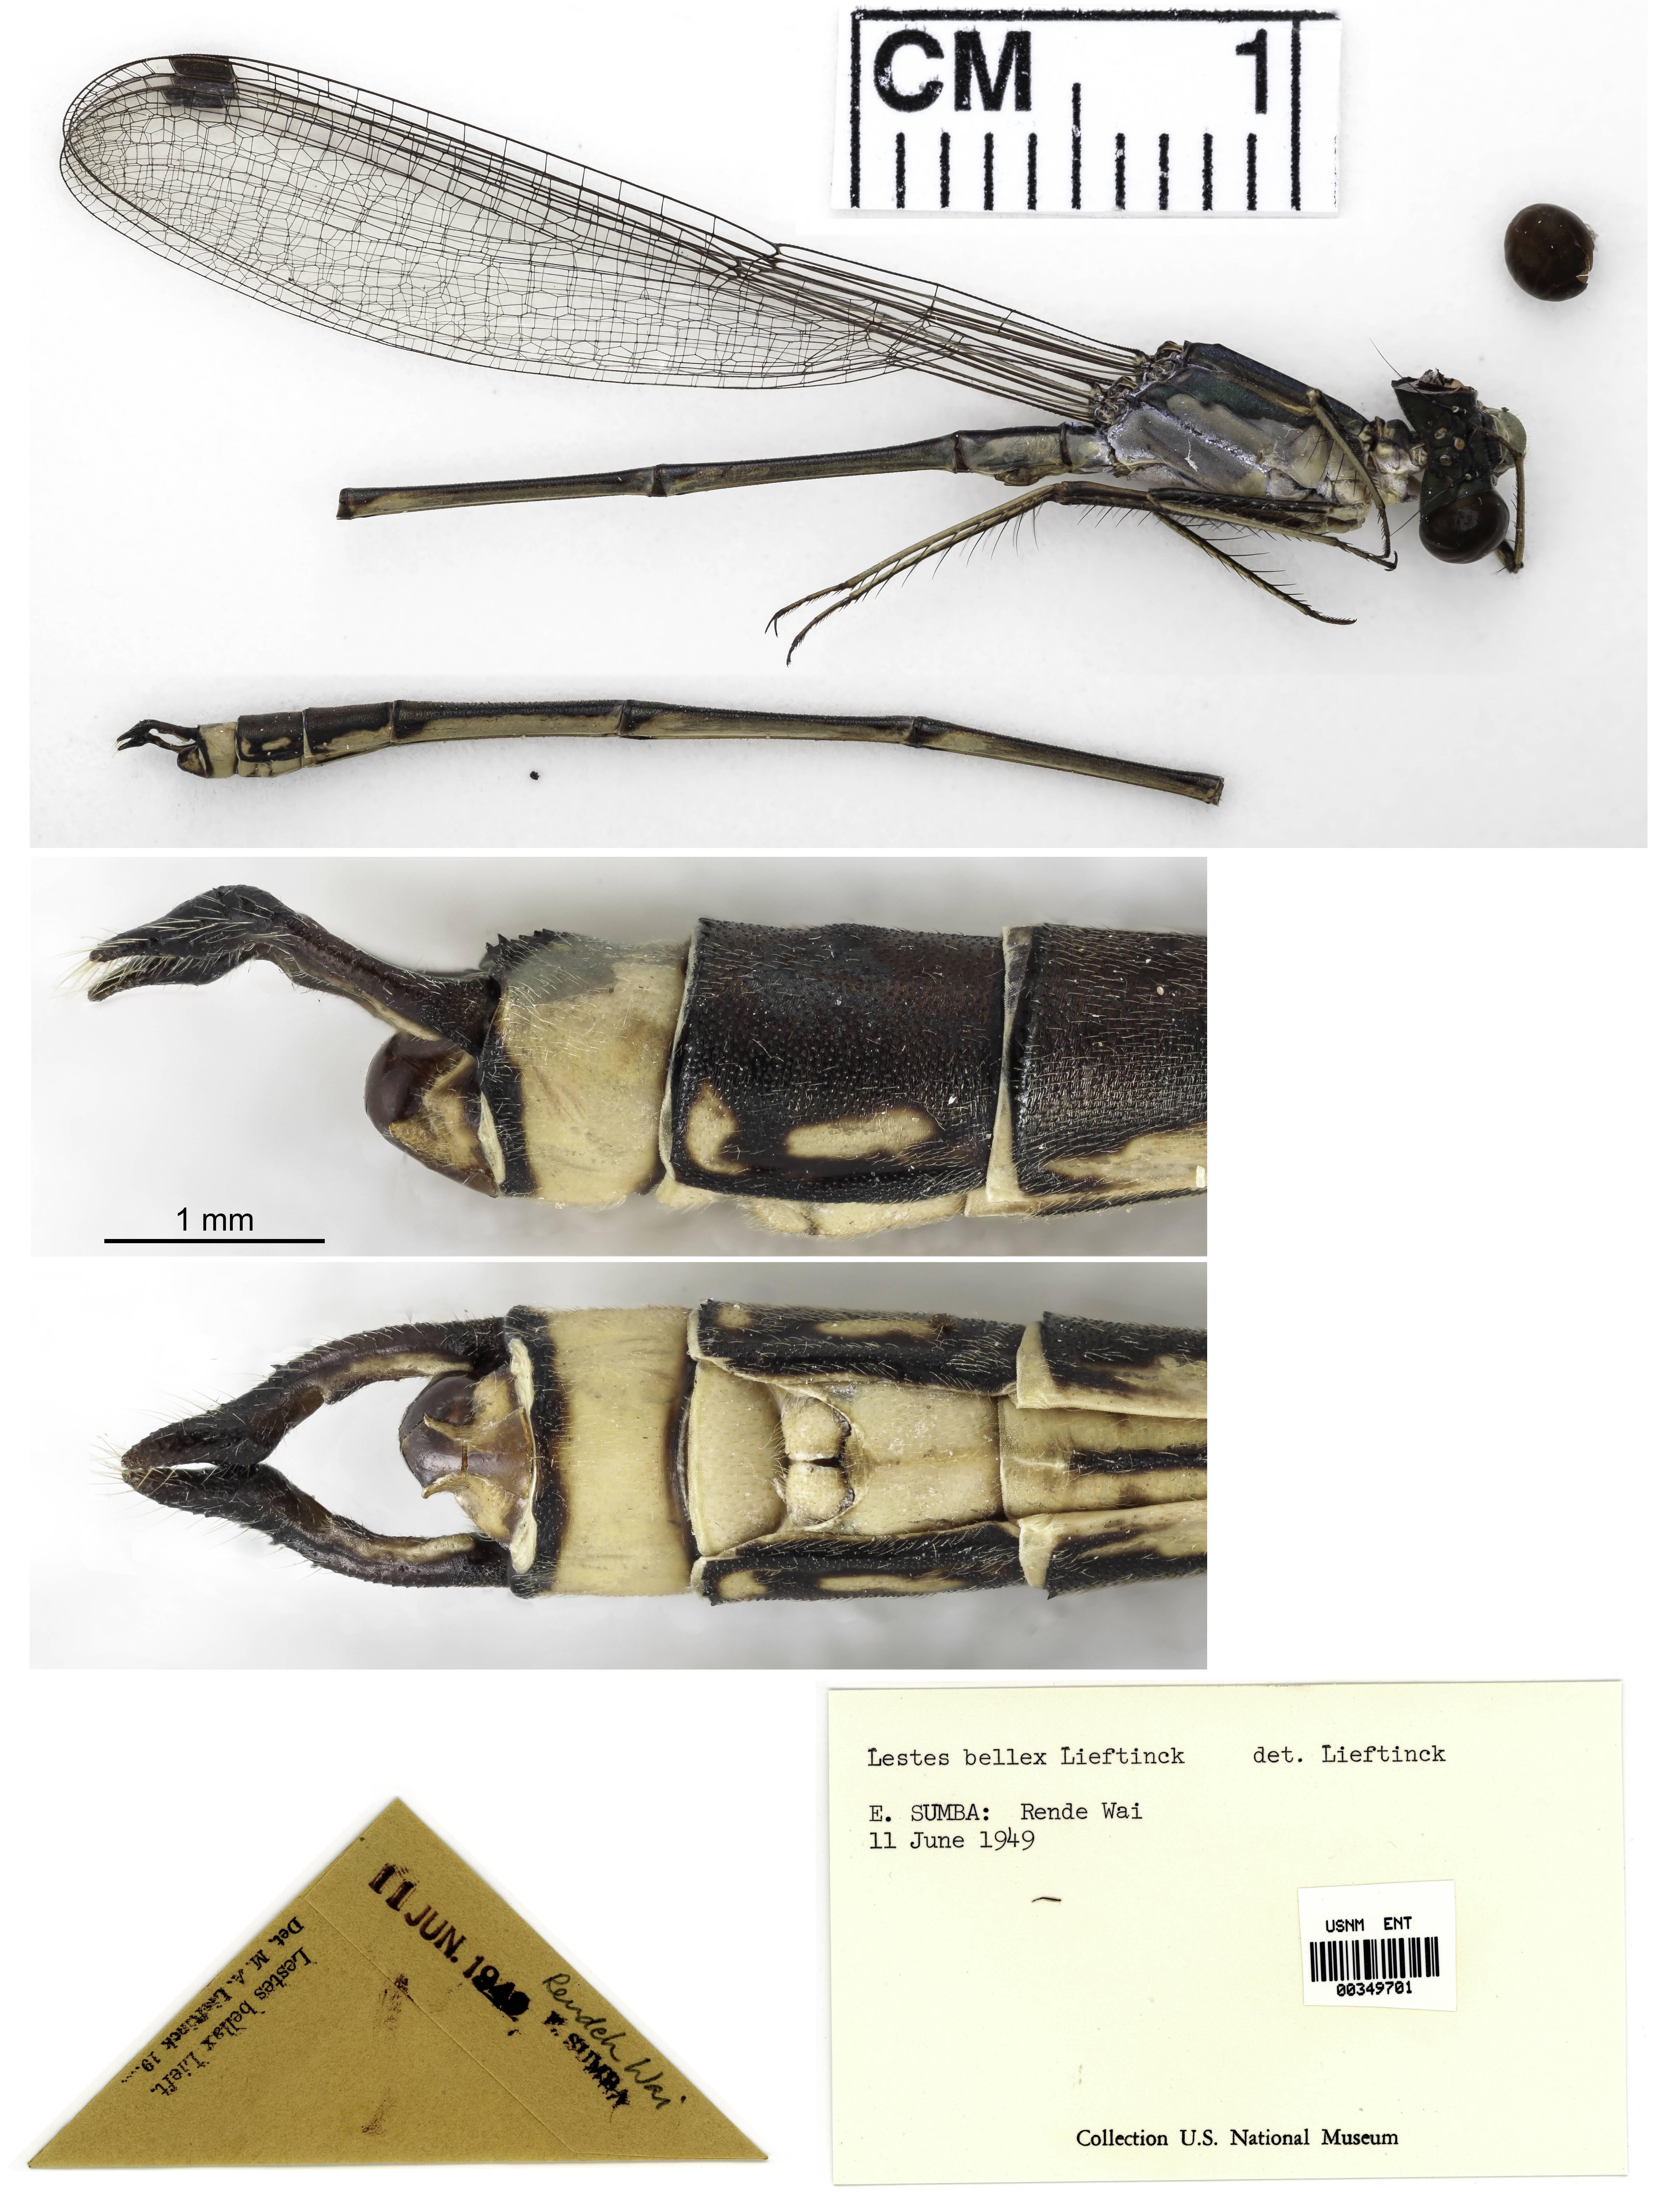 Image of <i>Indolestes bellax</i> (Lieftinck 1930)